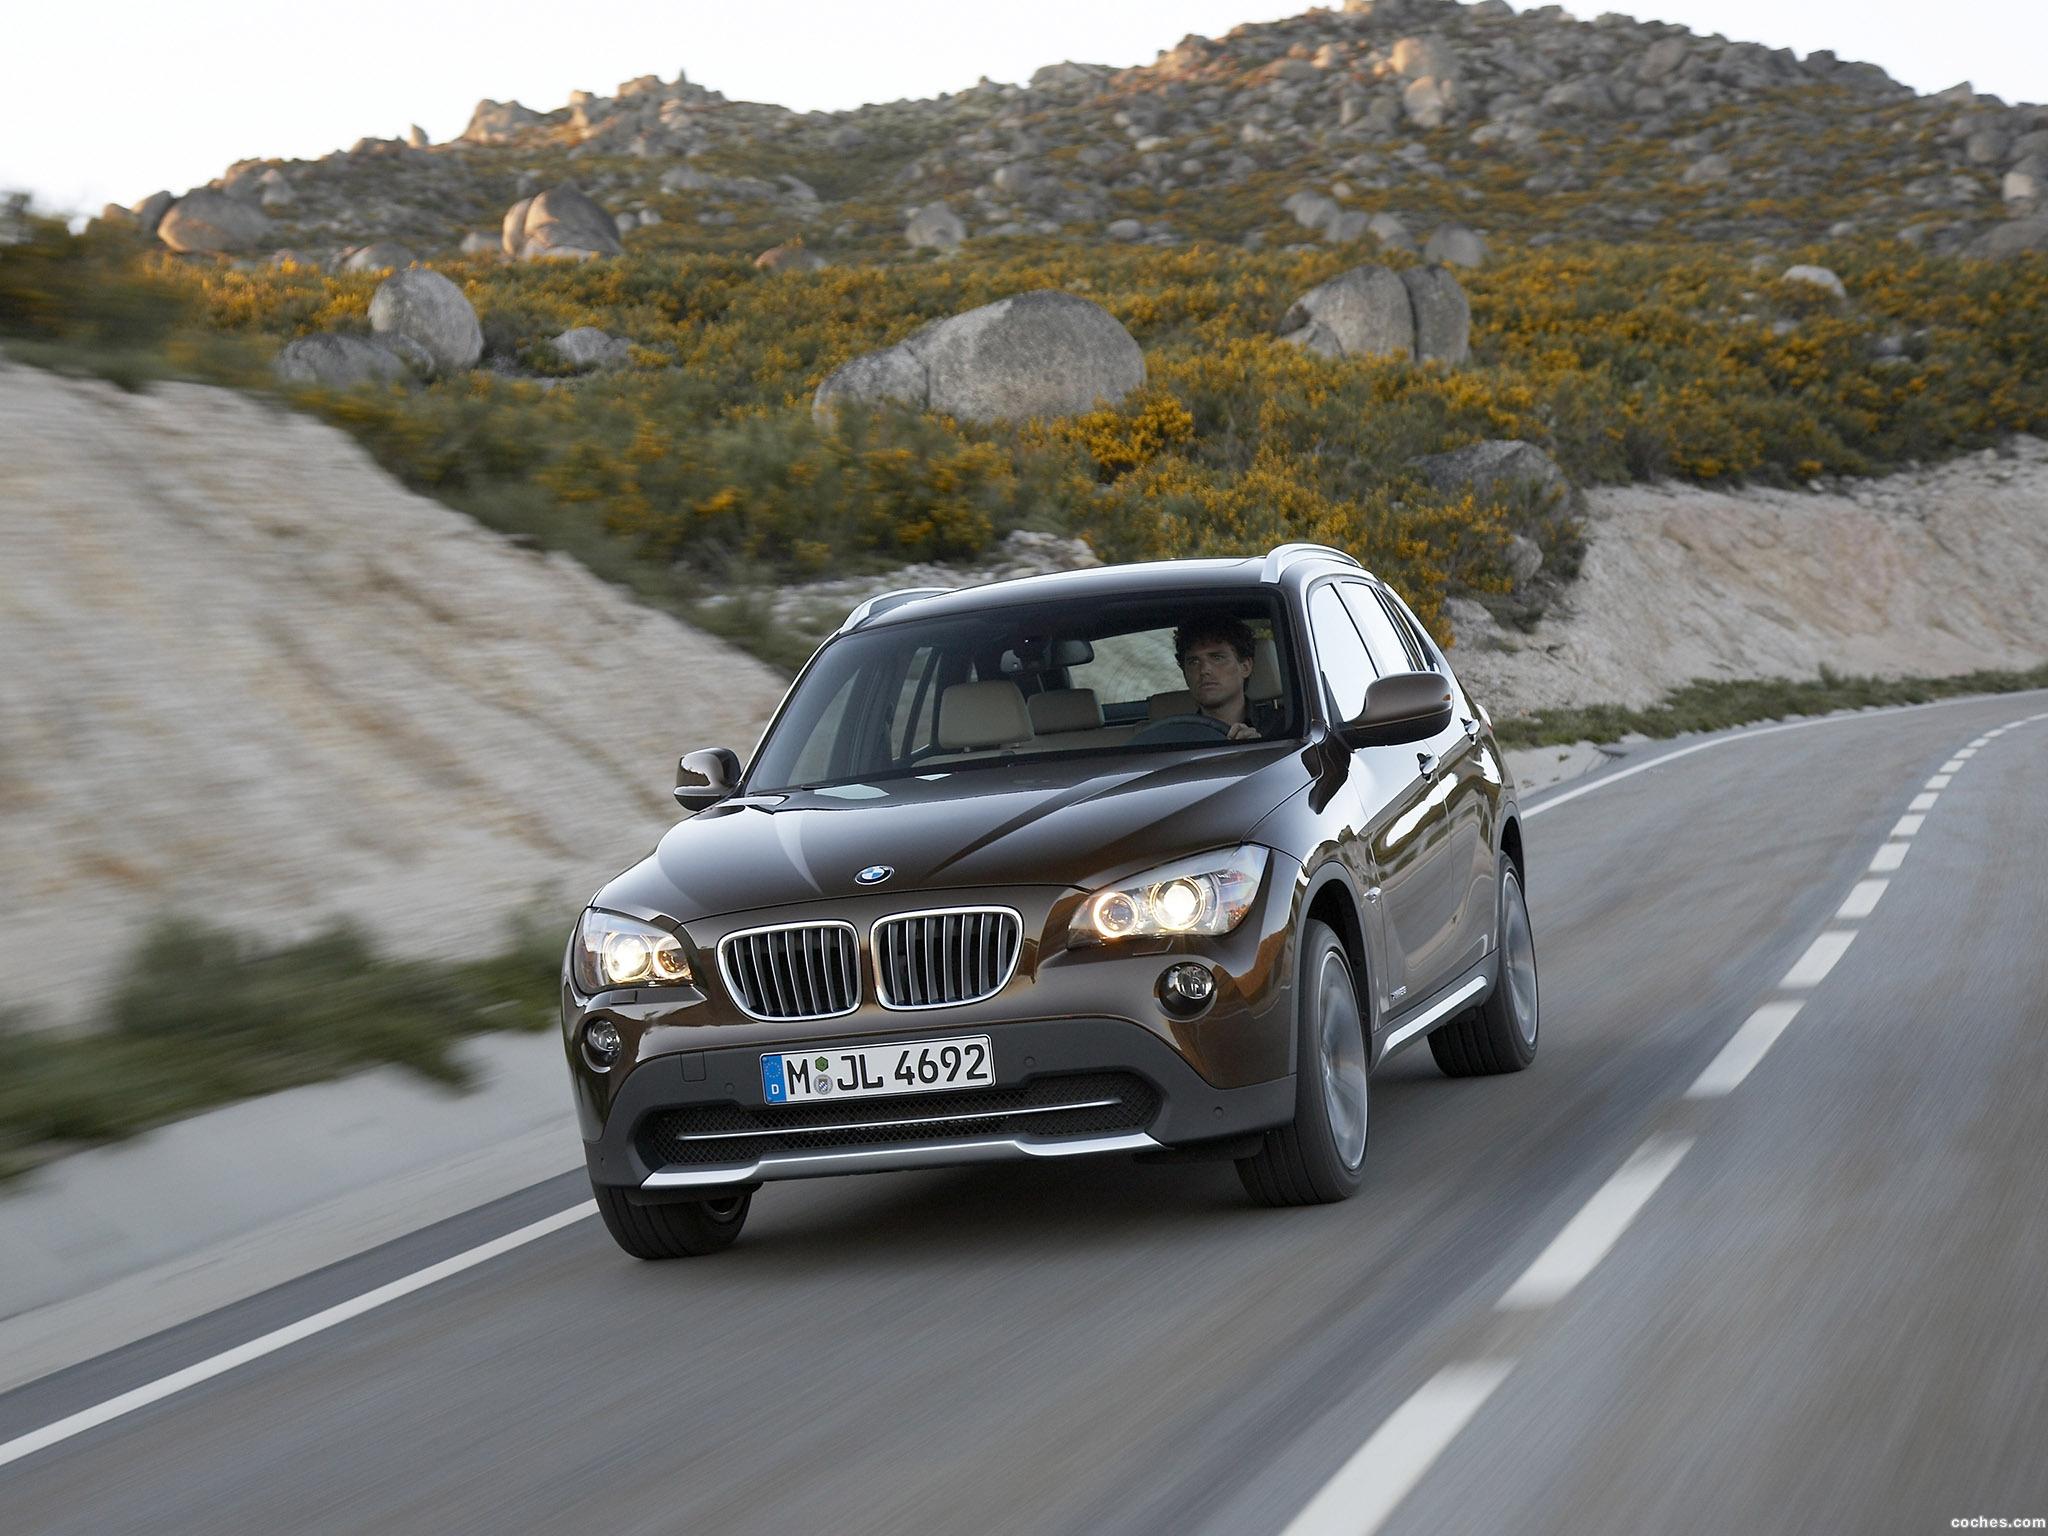 Foto 13 de BMW X1 xDrive28i 2009